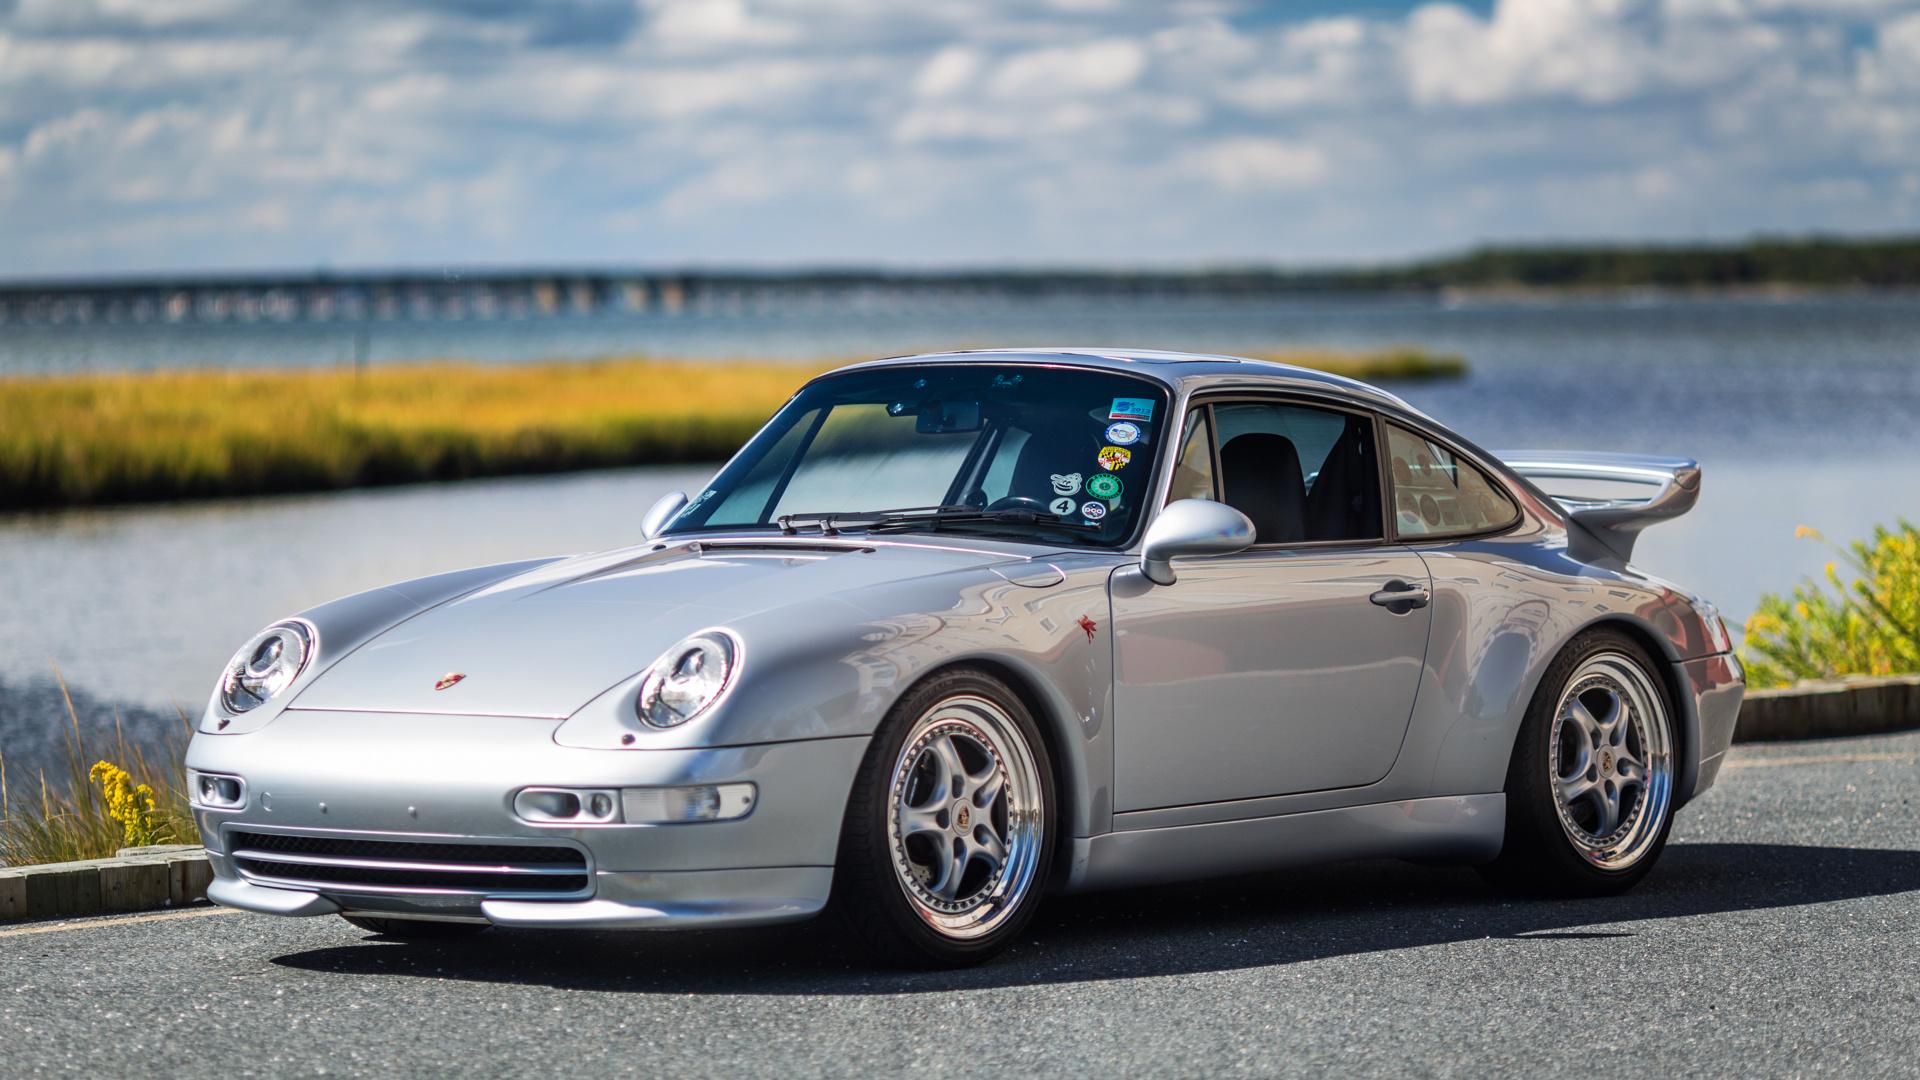 Porsche Hd Wallpapers 1080p: Porsche 911 Wallpapers, Pictures, Images